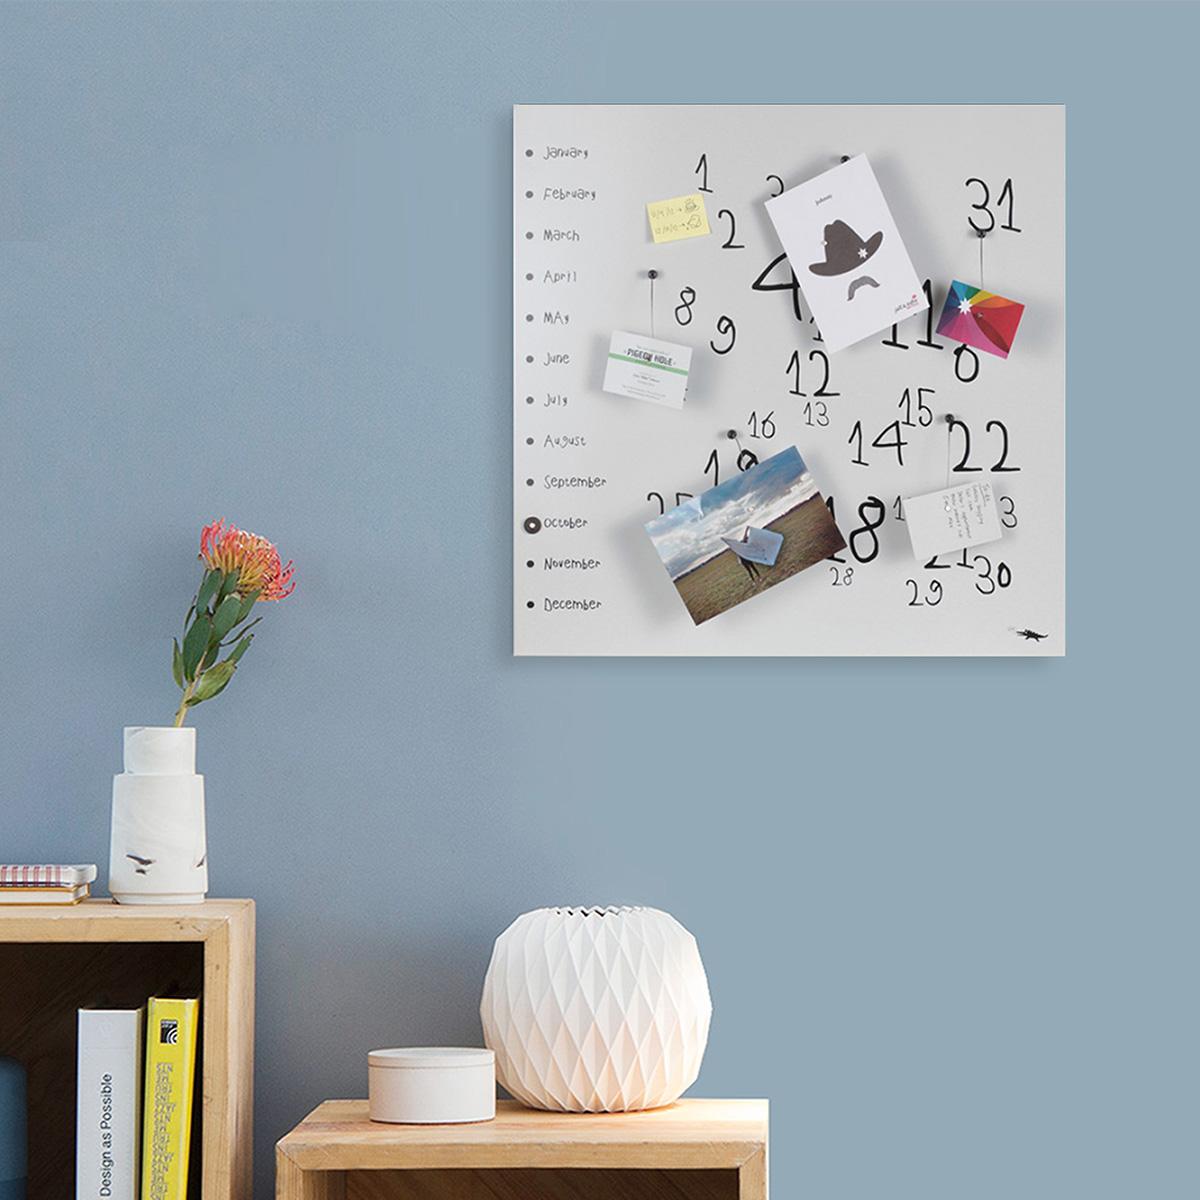 calendario-perpetuo-lavagna-magnetica-magnetic-board-perpetual-calendar-moo-kro1-white